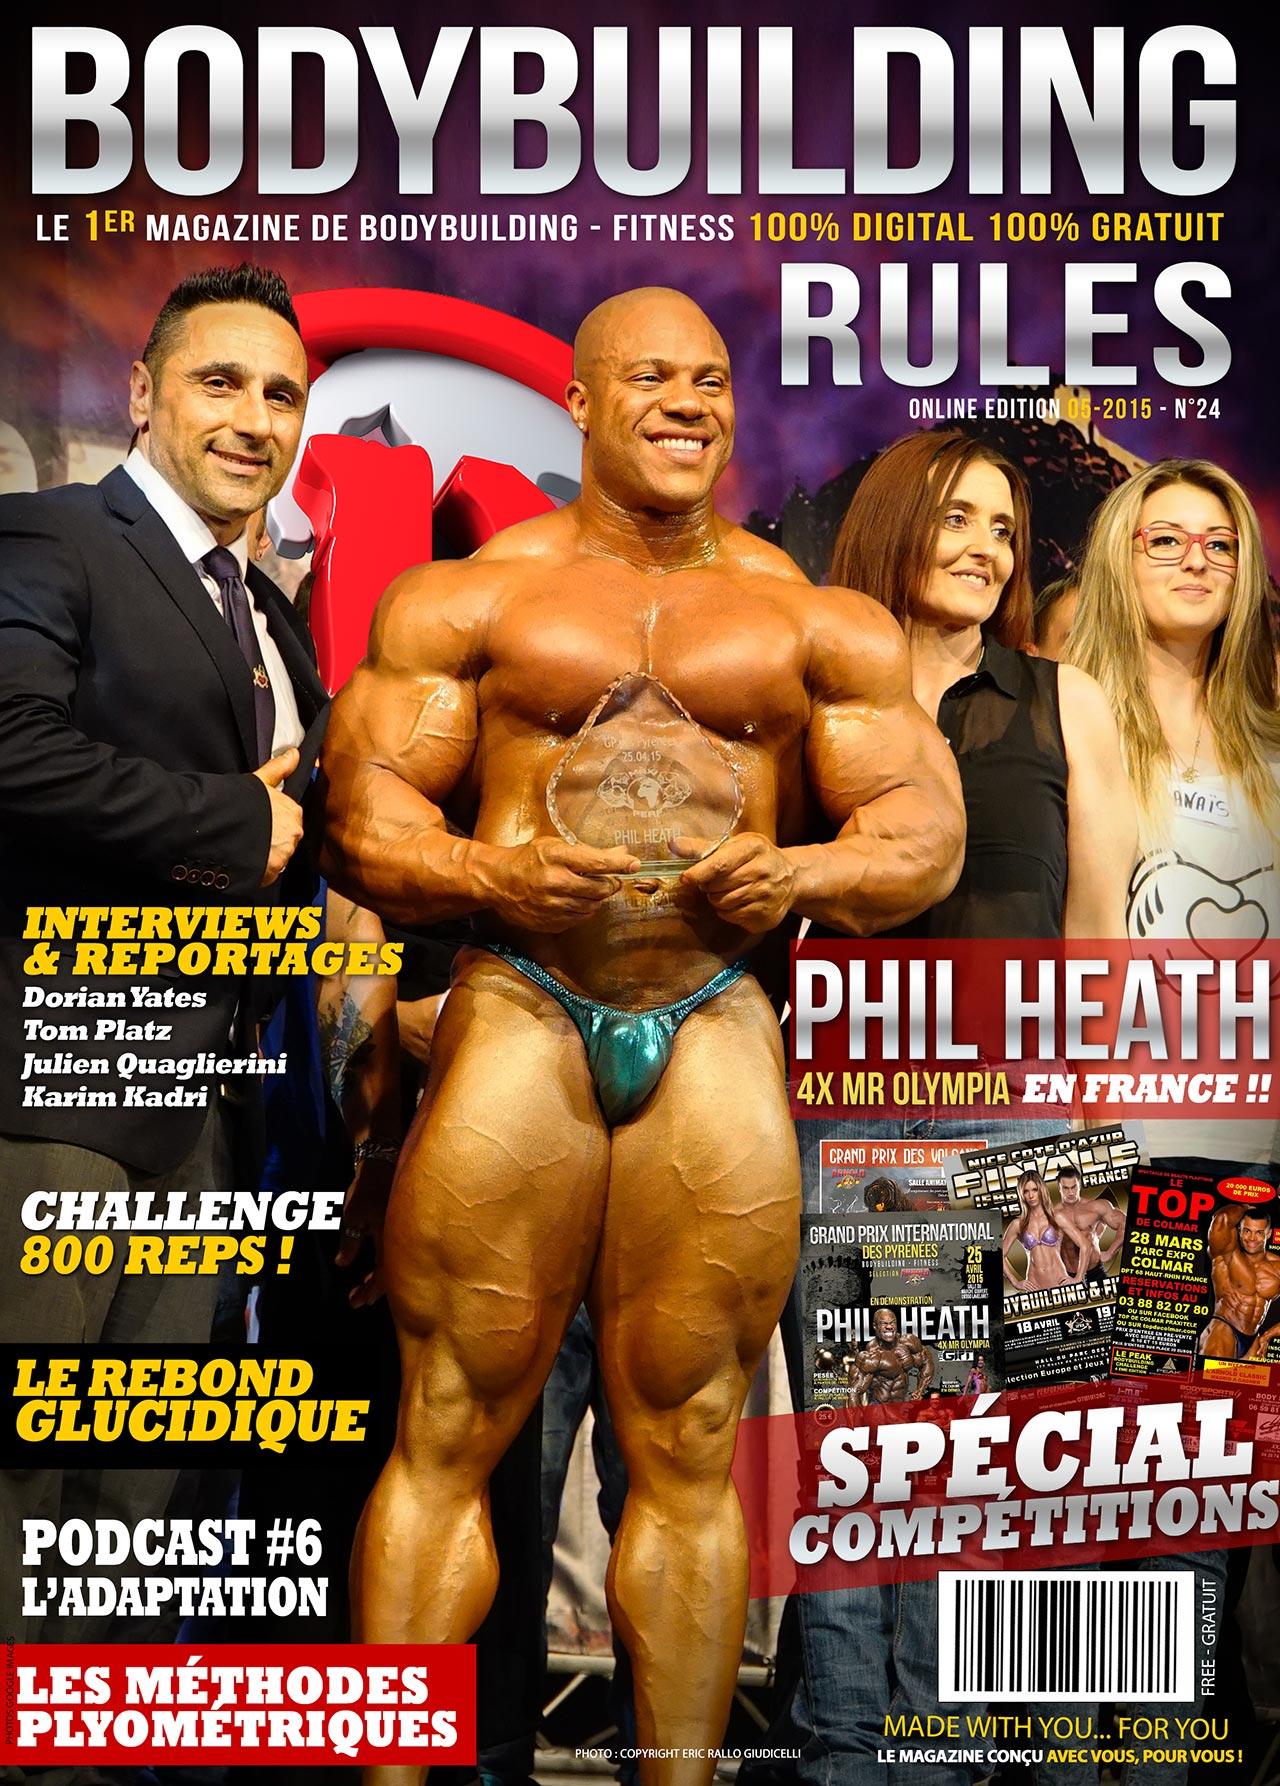 magazine - www.bodybuilding-rules.com le magazine interactif GRATUIT  1bbrM24